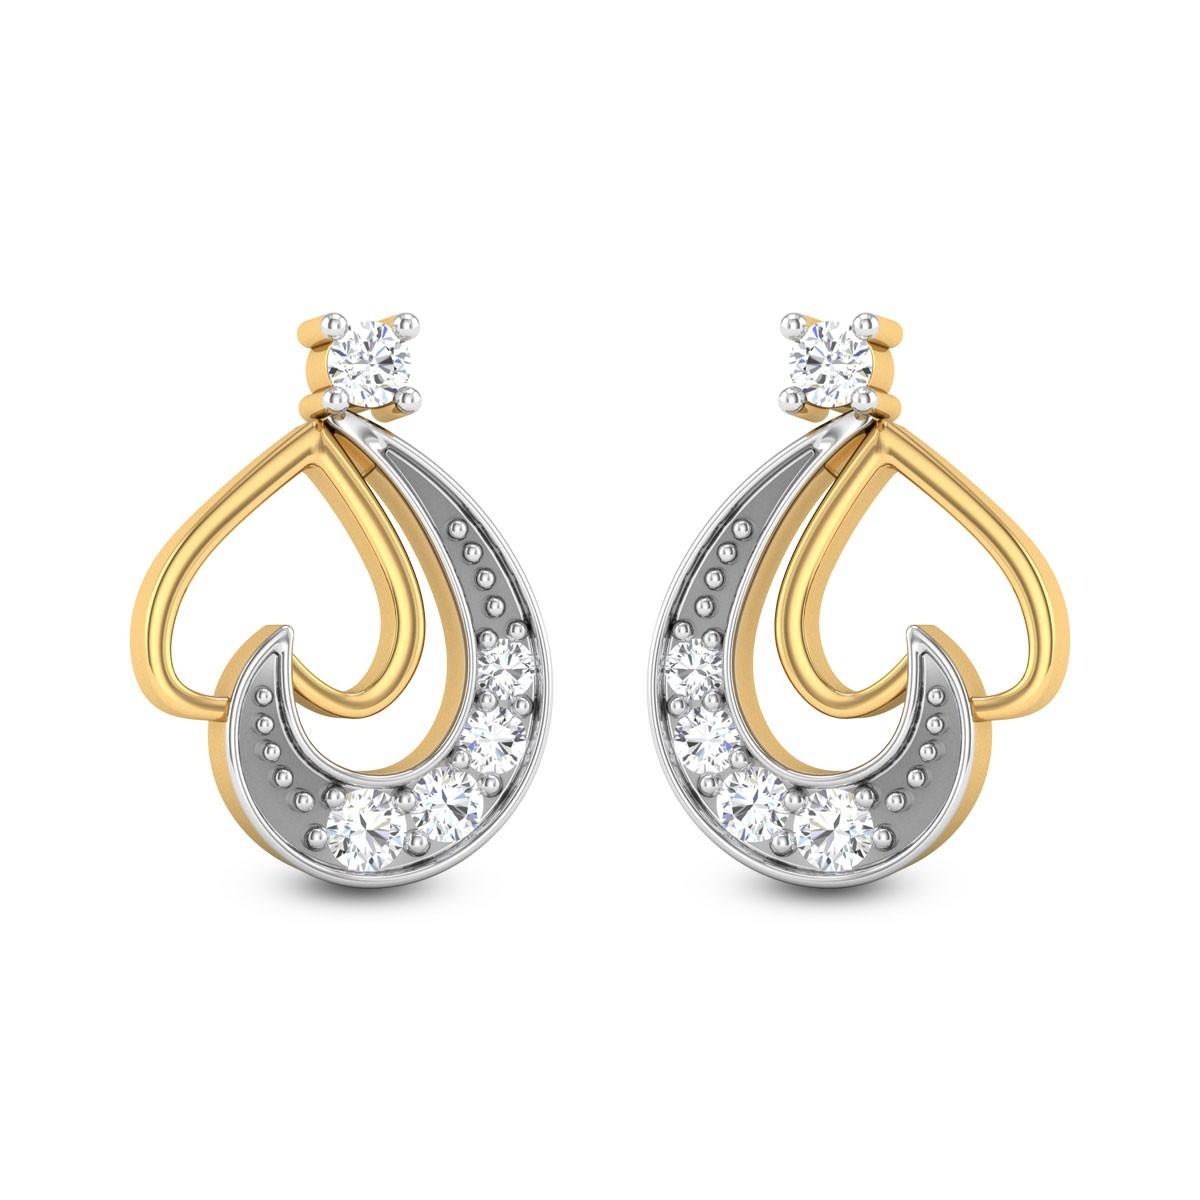 Donatella Heart Diamond Stud Earrings